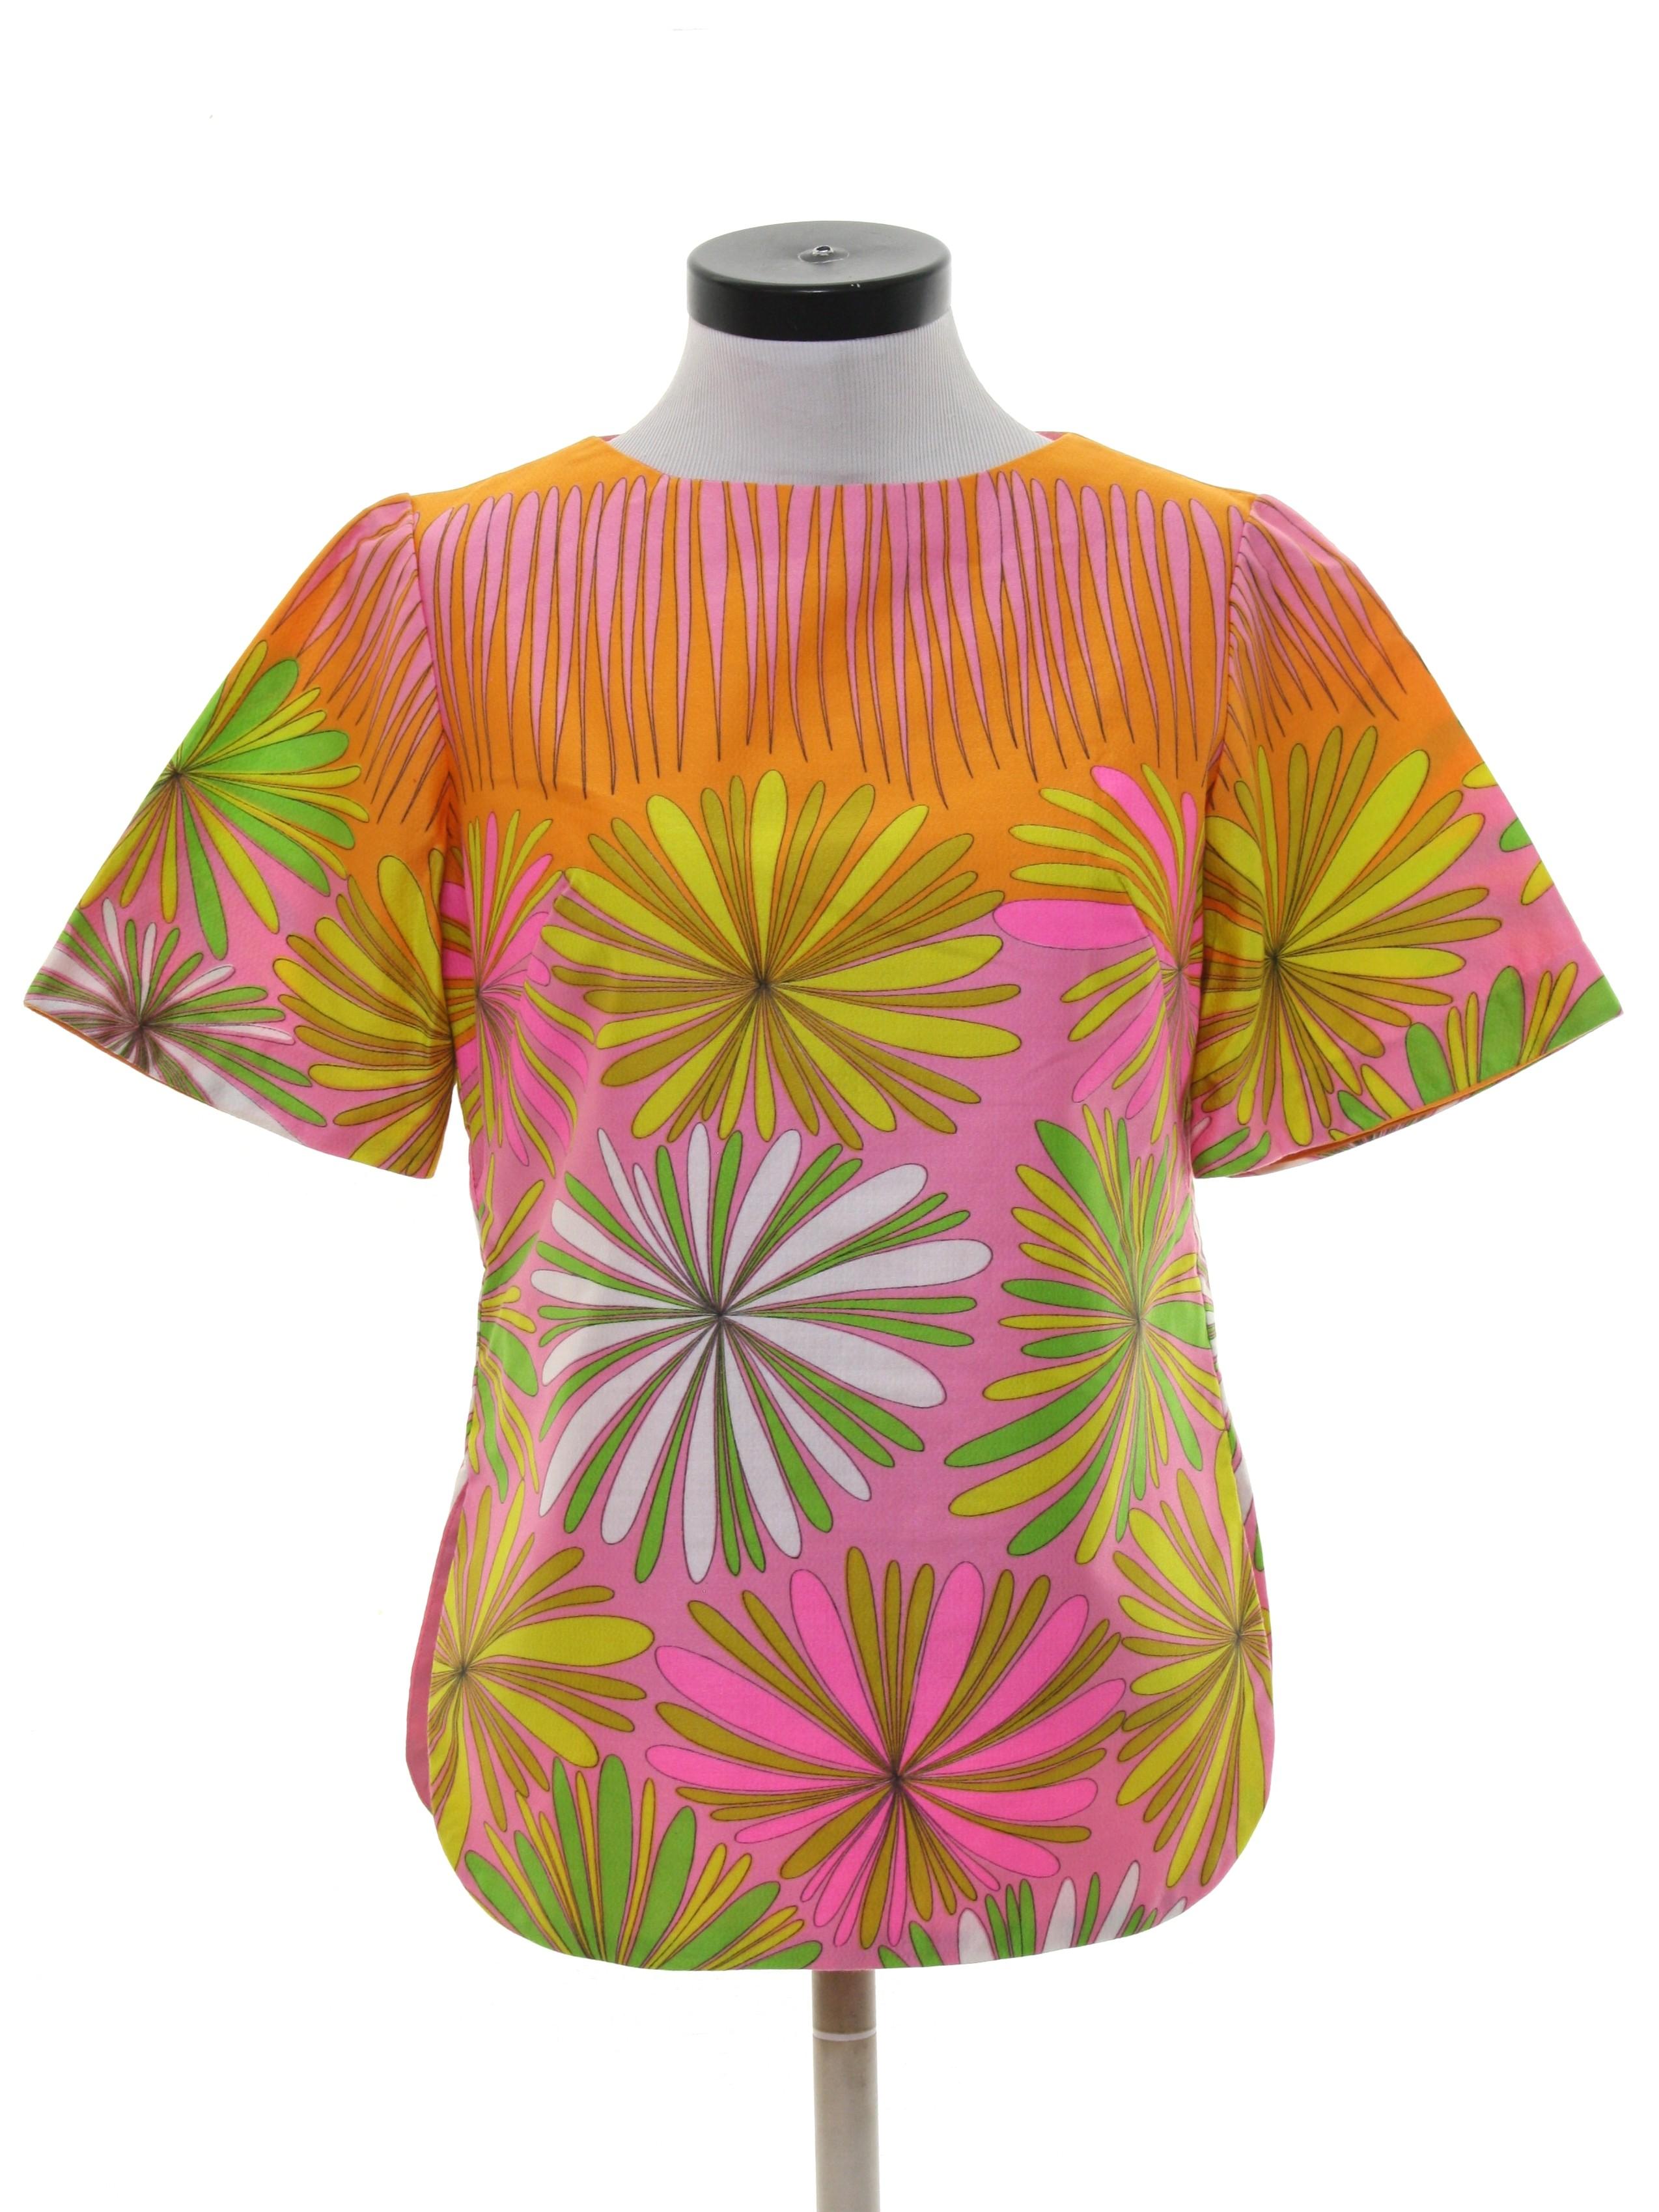 eff0dfc1b3d Retro Seventies Shirt  70s -Alex Colman- Womens pink background ...